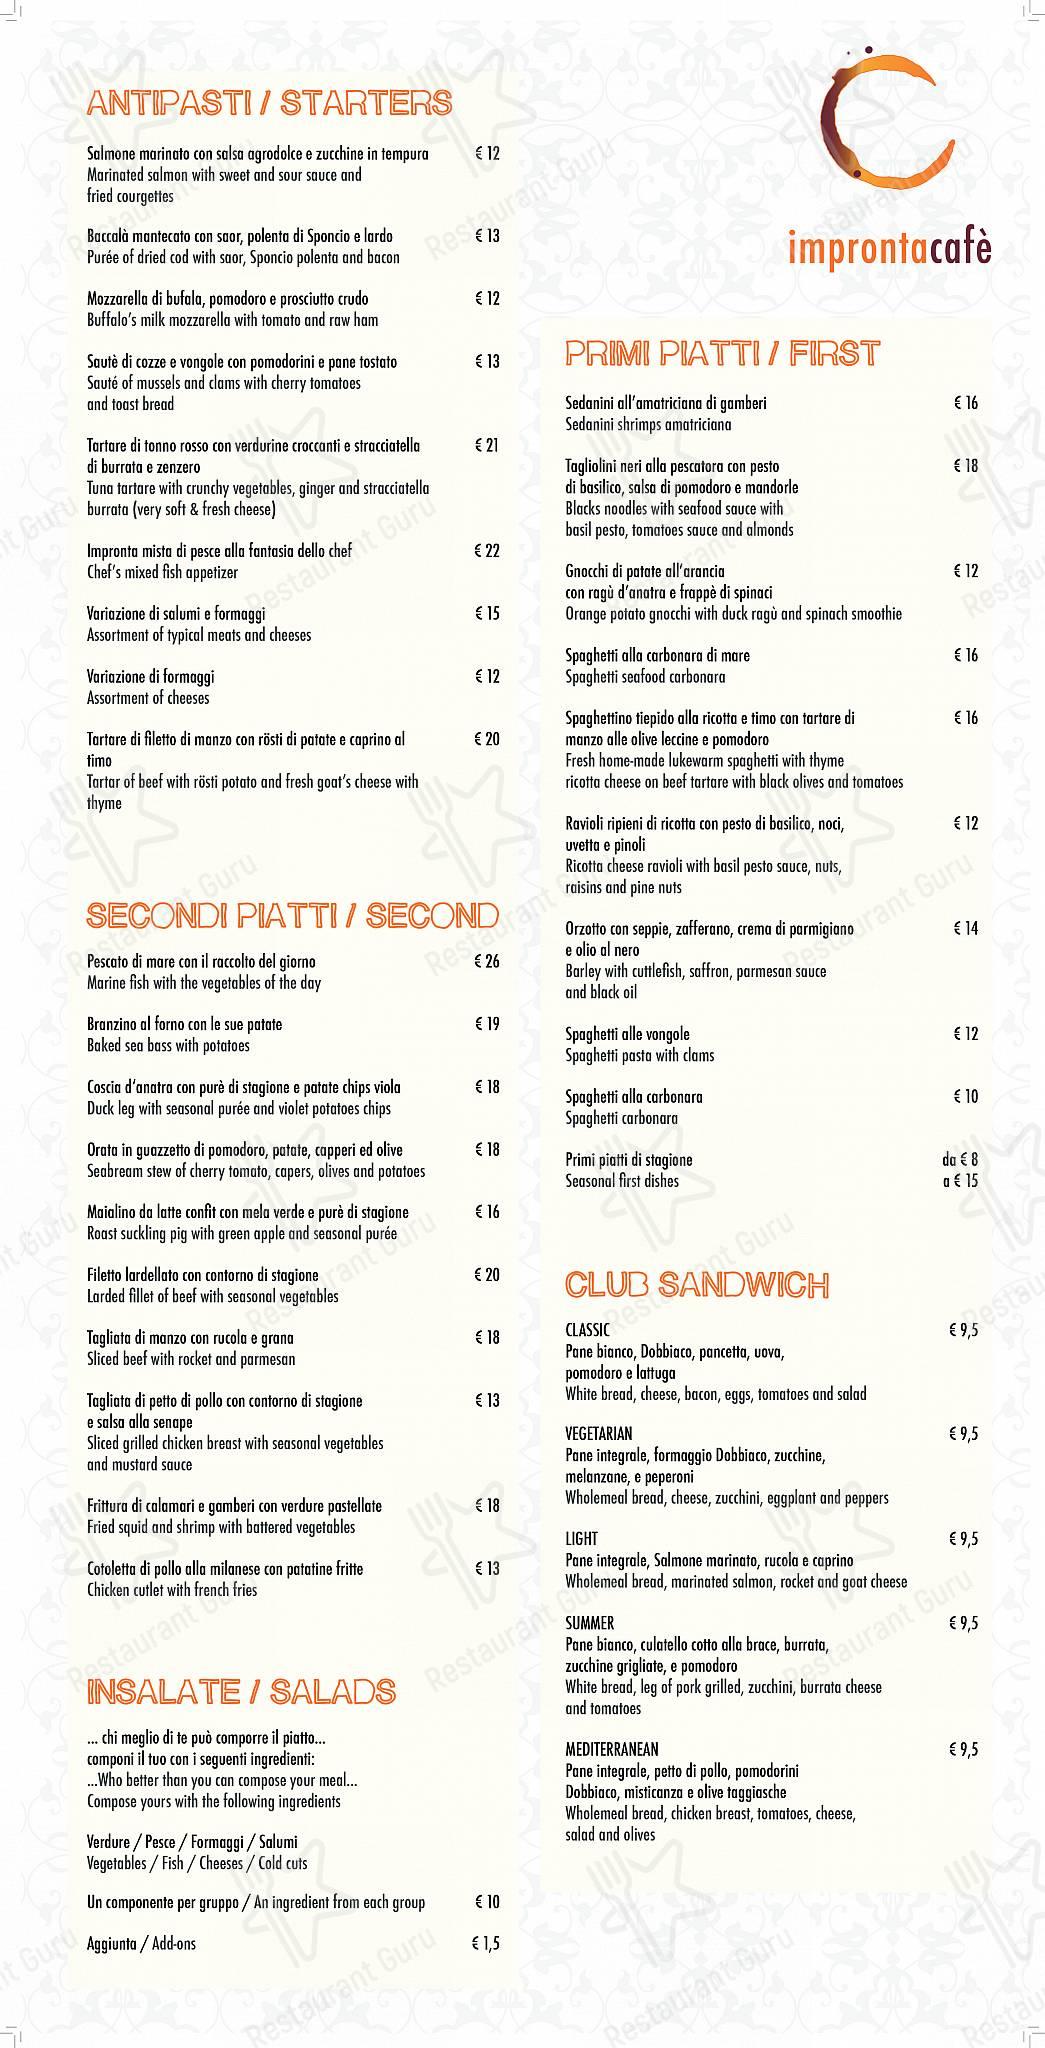 Impronta menu - dishes and beverages